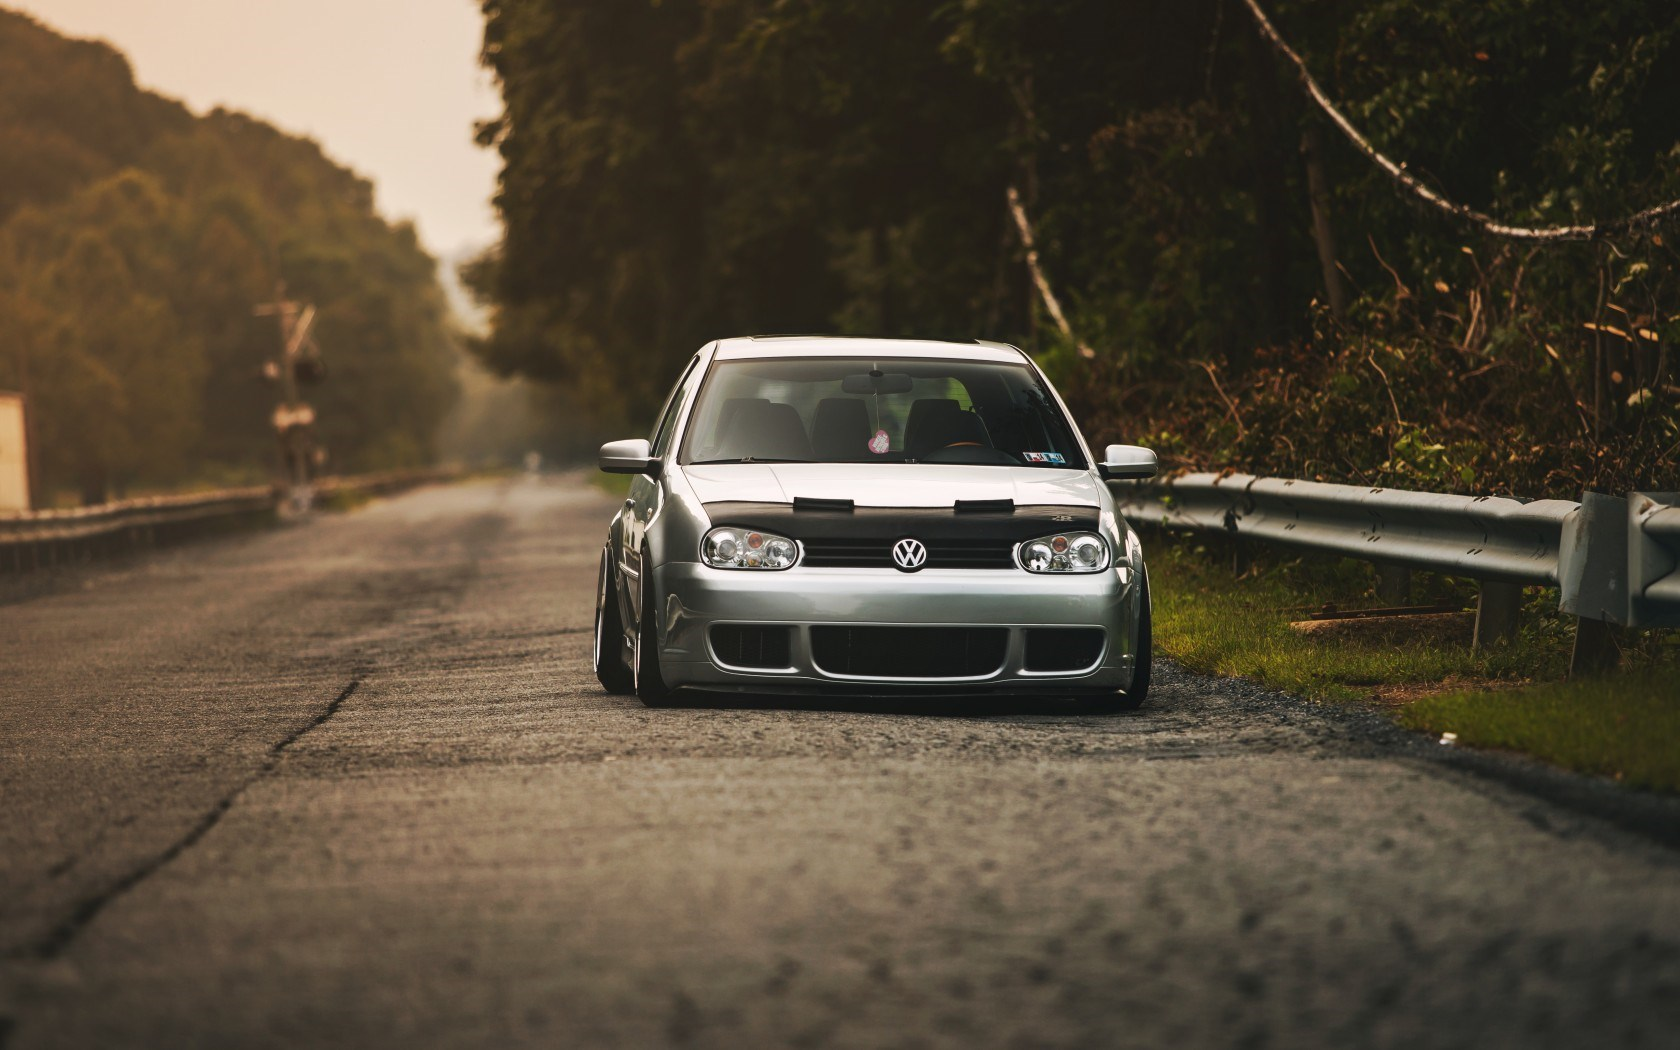 Volkswagen Golf MK4 Tuning Car Road